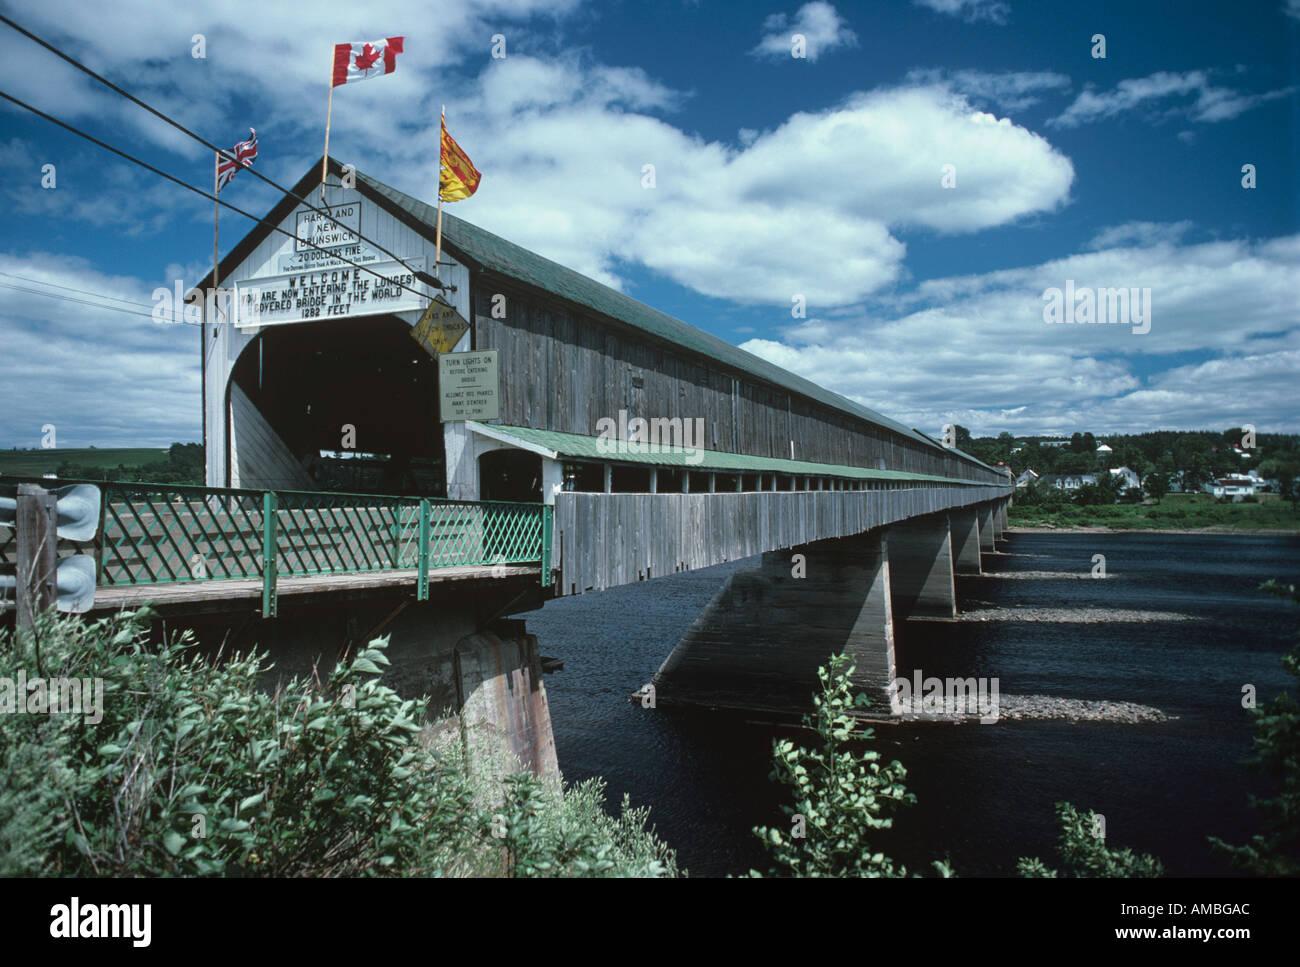 Dating sites in new brunswick kanada